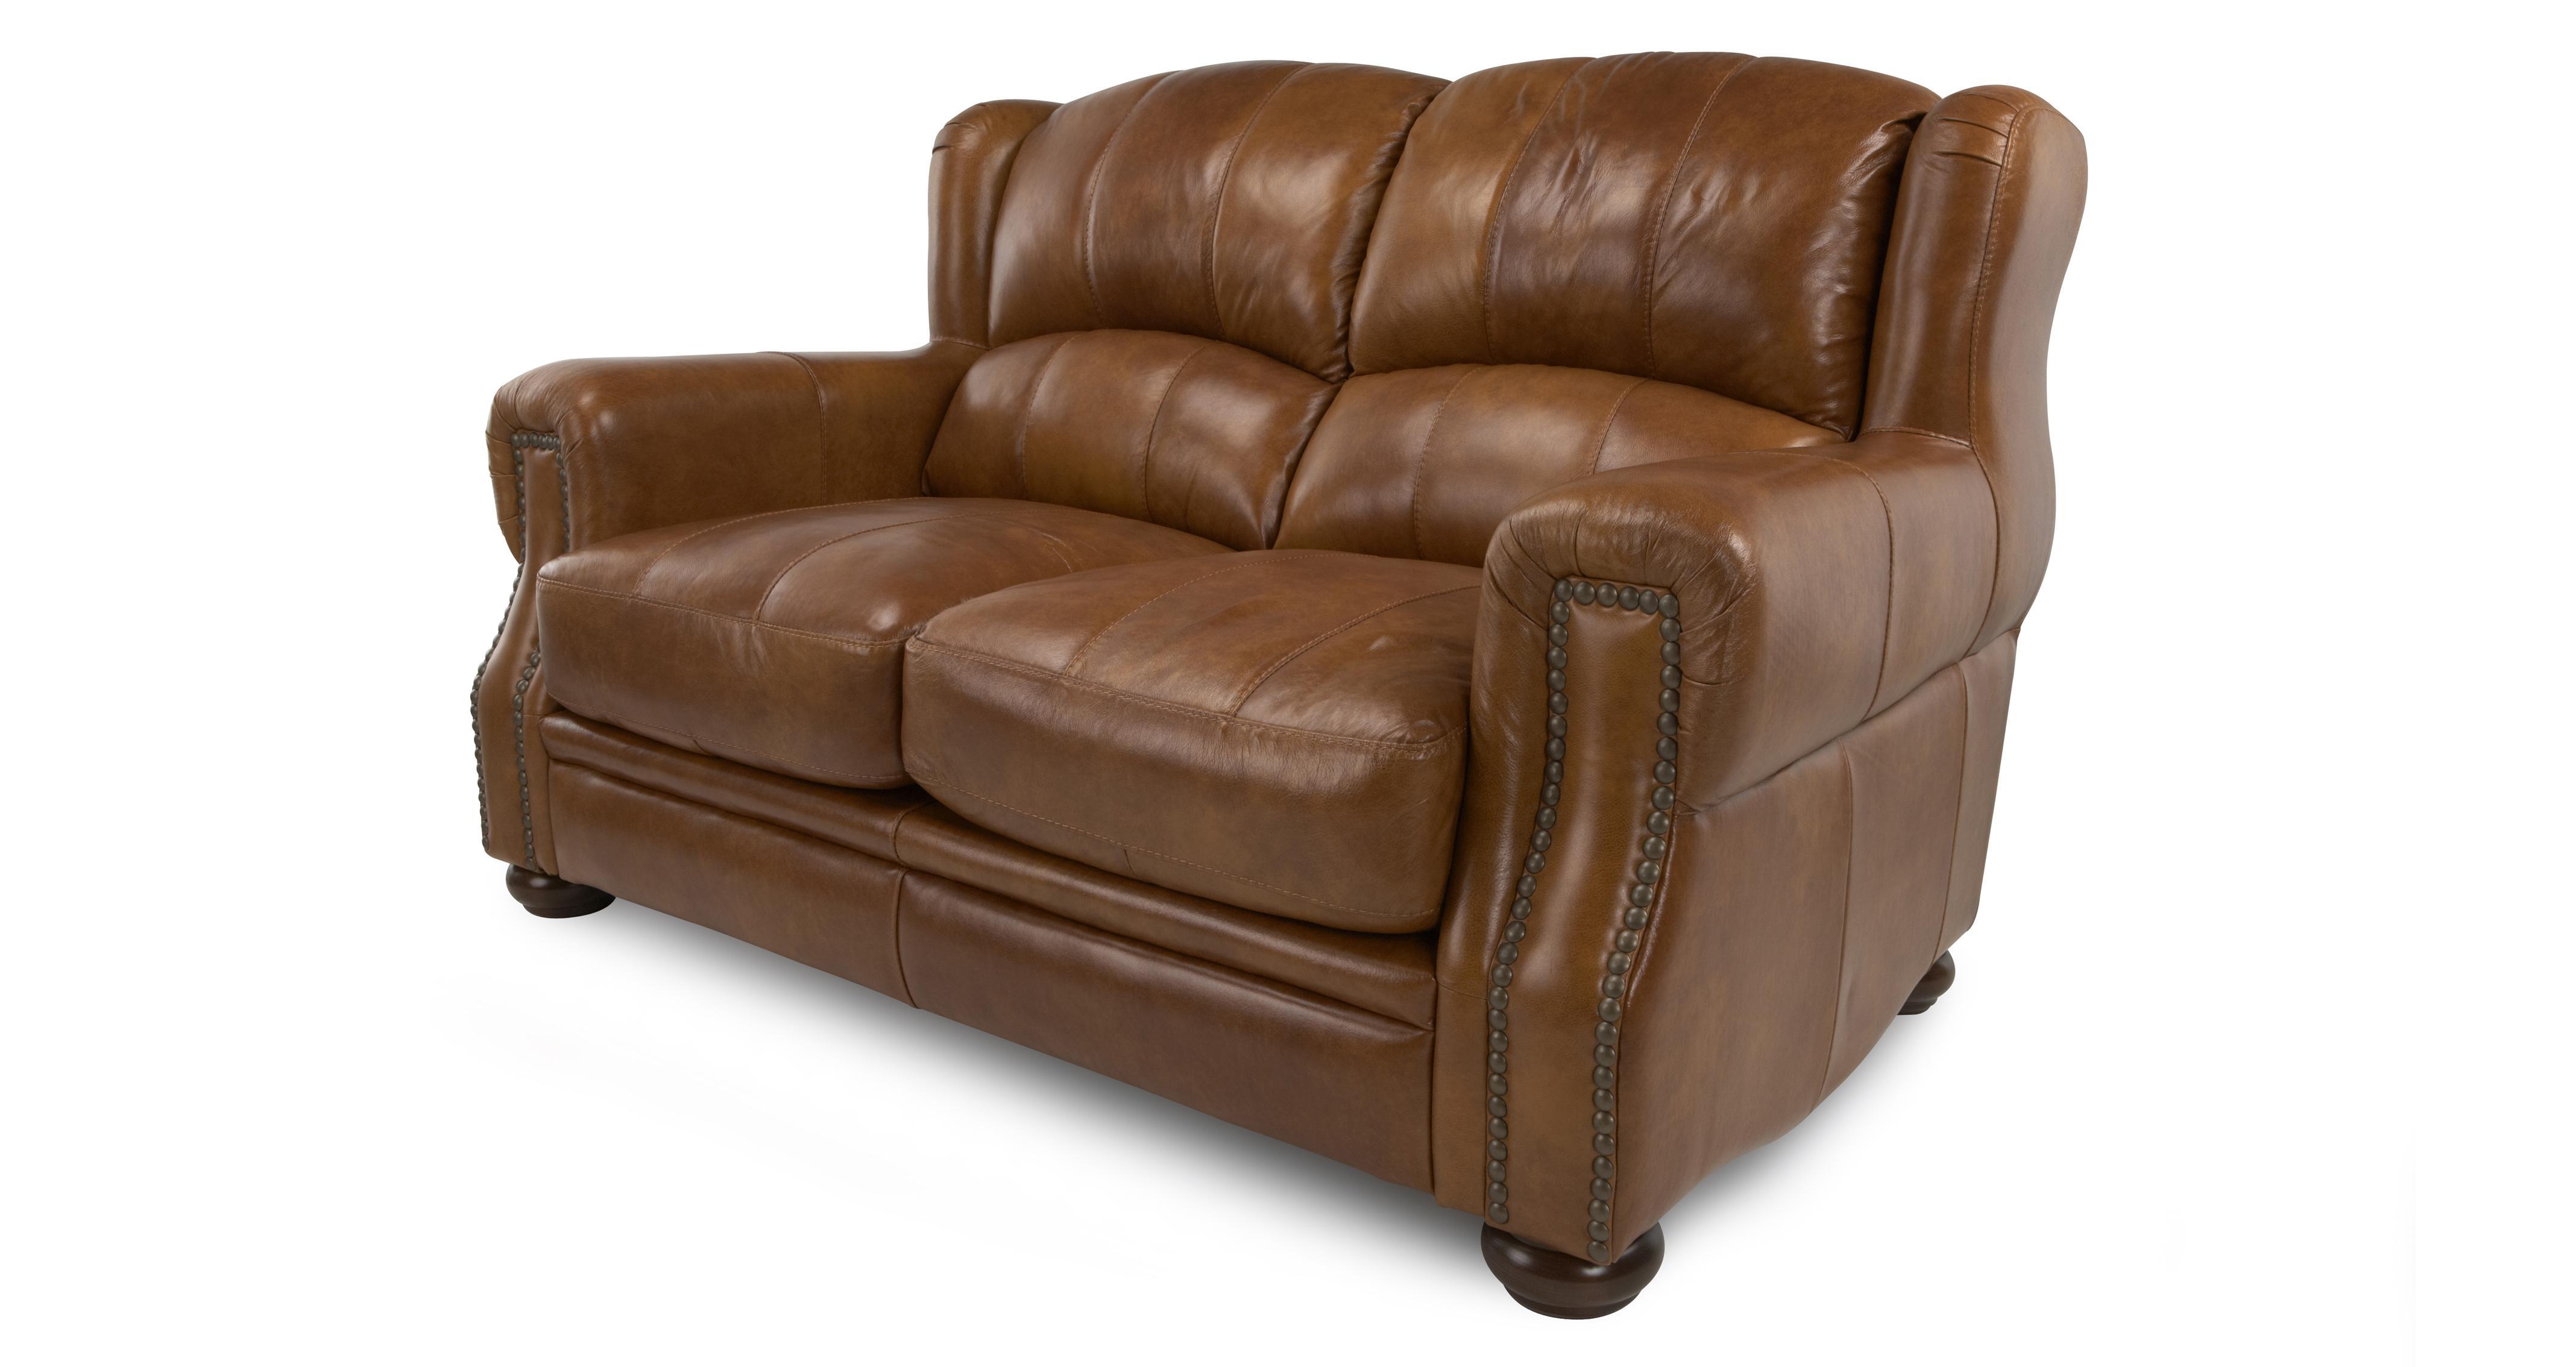 vine brown leather sofa ebay lack table images dfs hale natural chestnut suite 2 seater